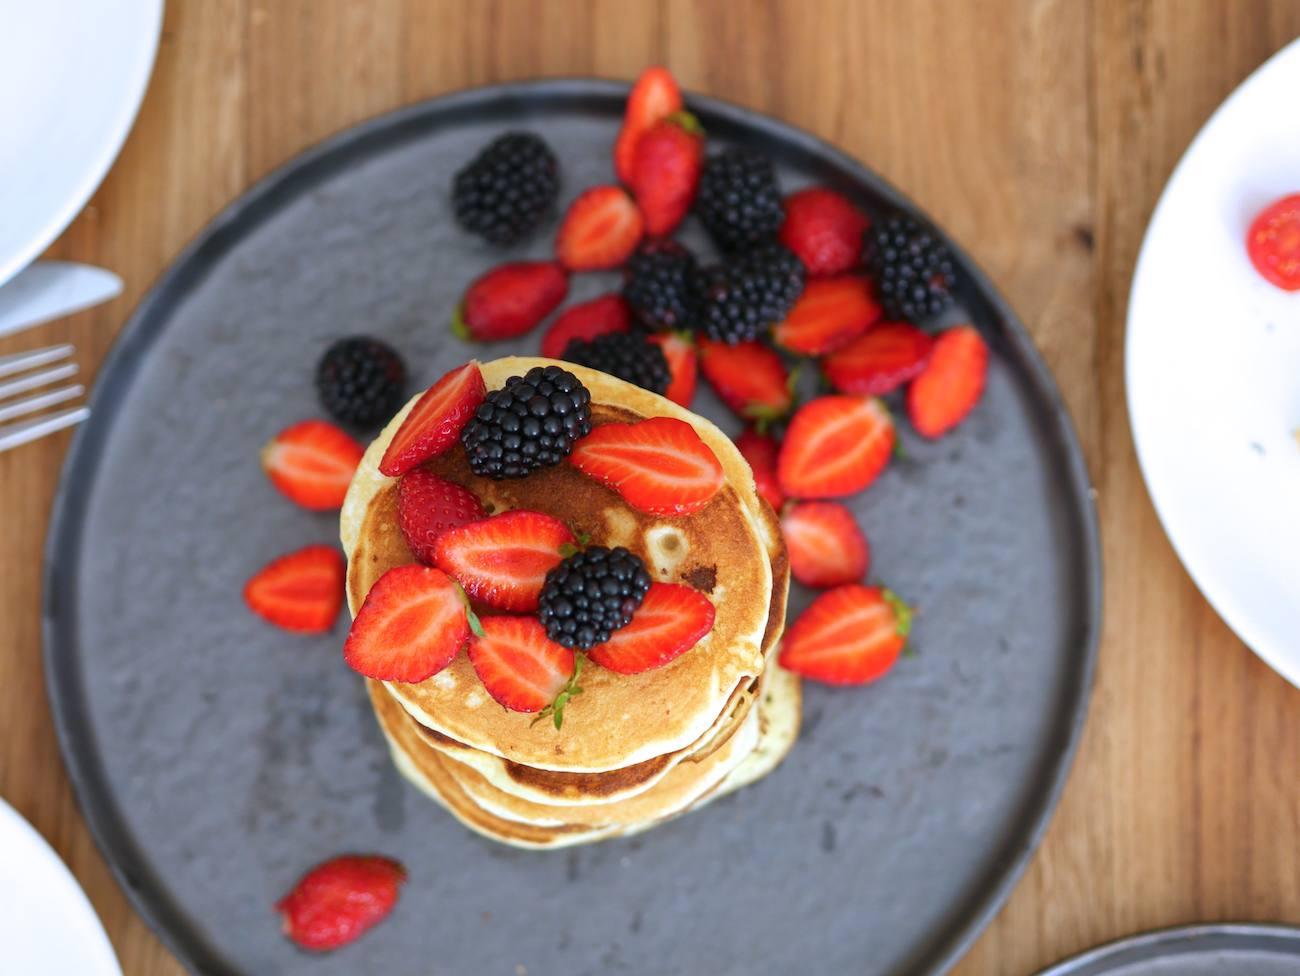 brunch-maison-recette-pancakes-toast-oeuf-benedicte-infuz-10